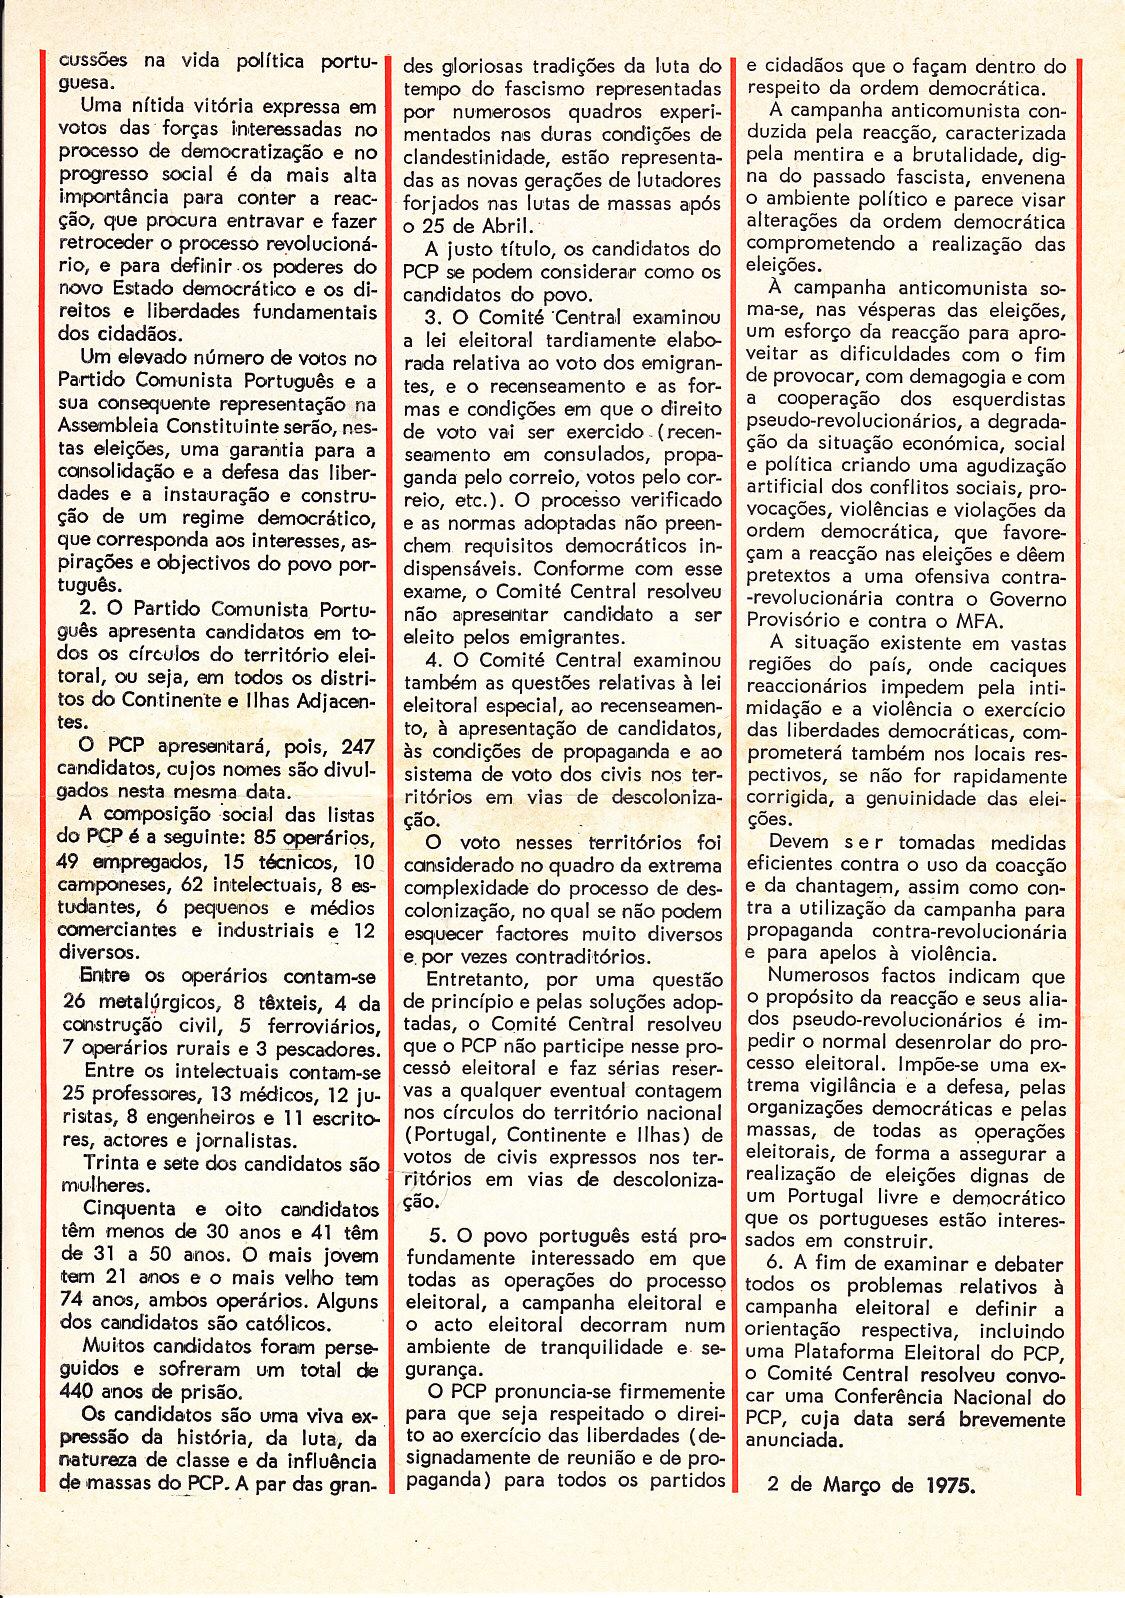 PCP_comunicado_1975_0002